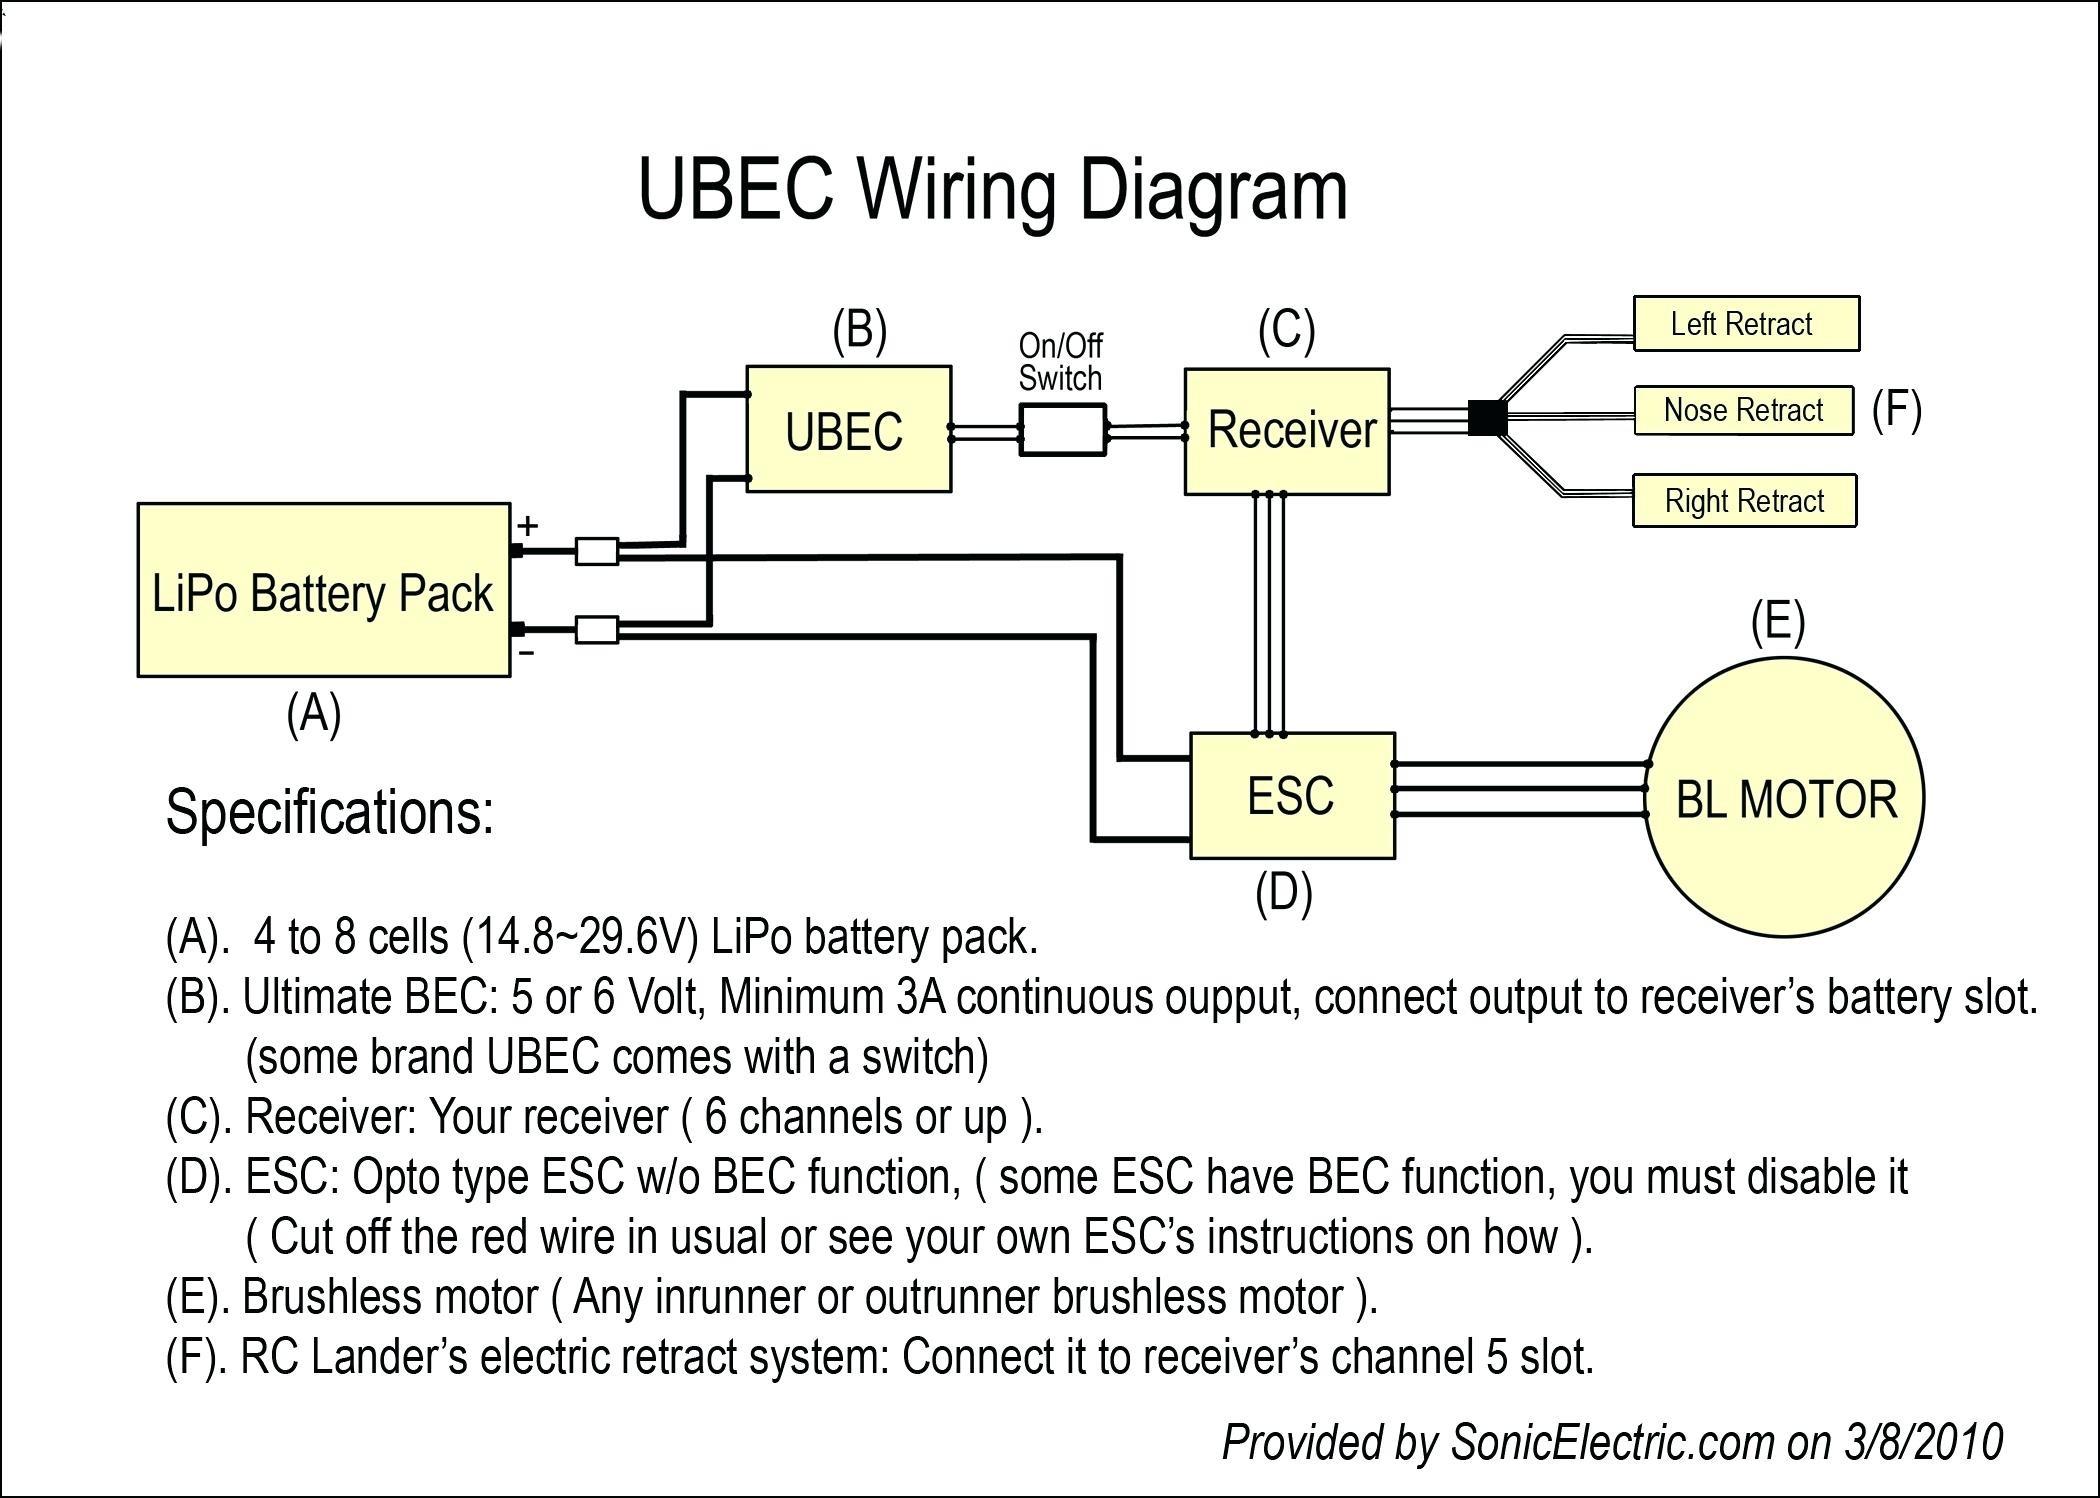 Electric Rc Car Diagram Car Diagram Rc Car Diagram Electric Rc Car Wiring Diagramelectric Of Electric Rc Car Diagram